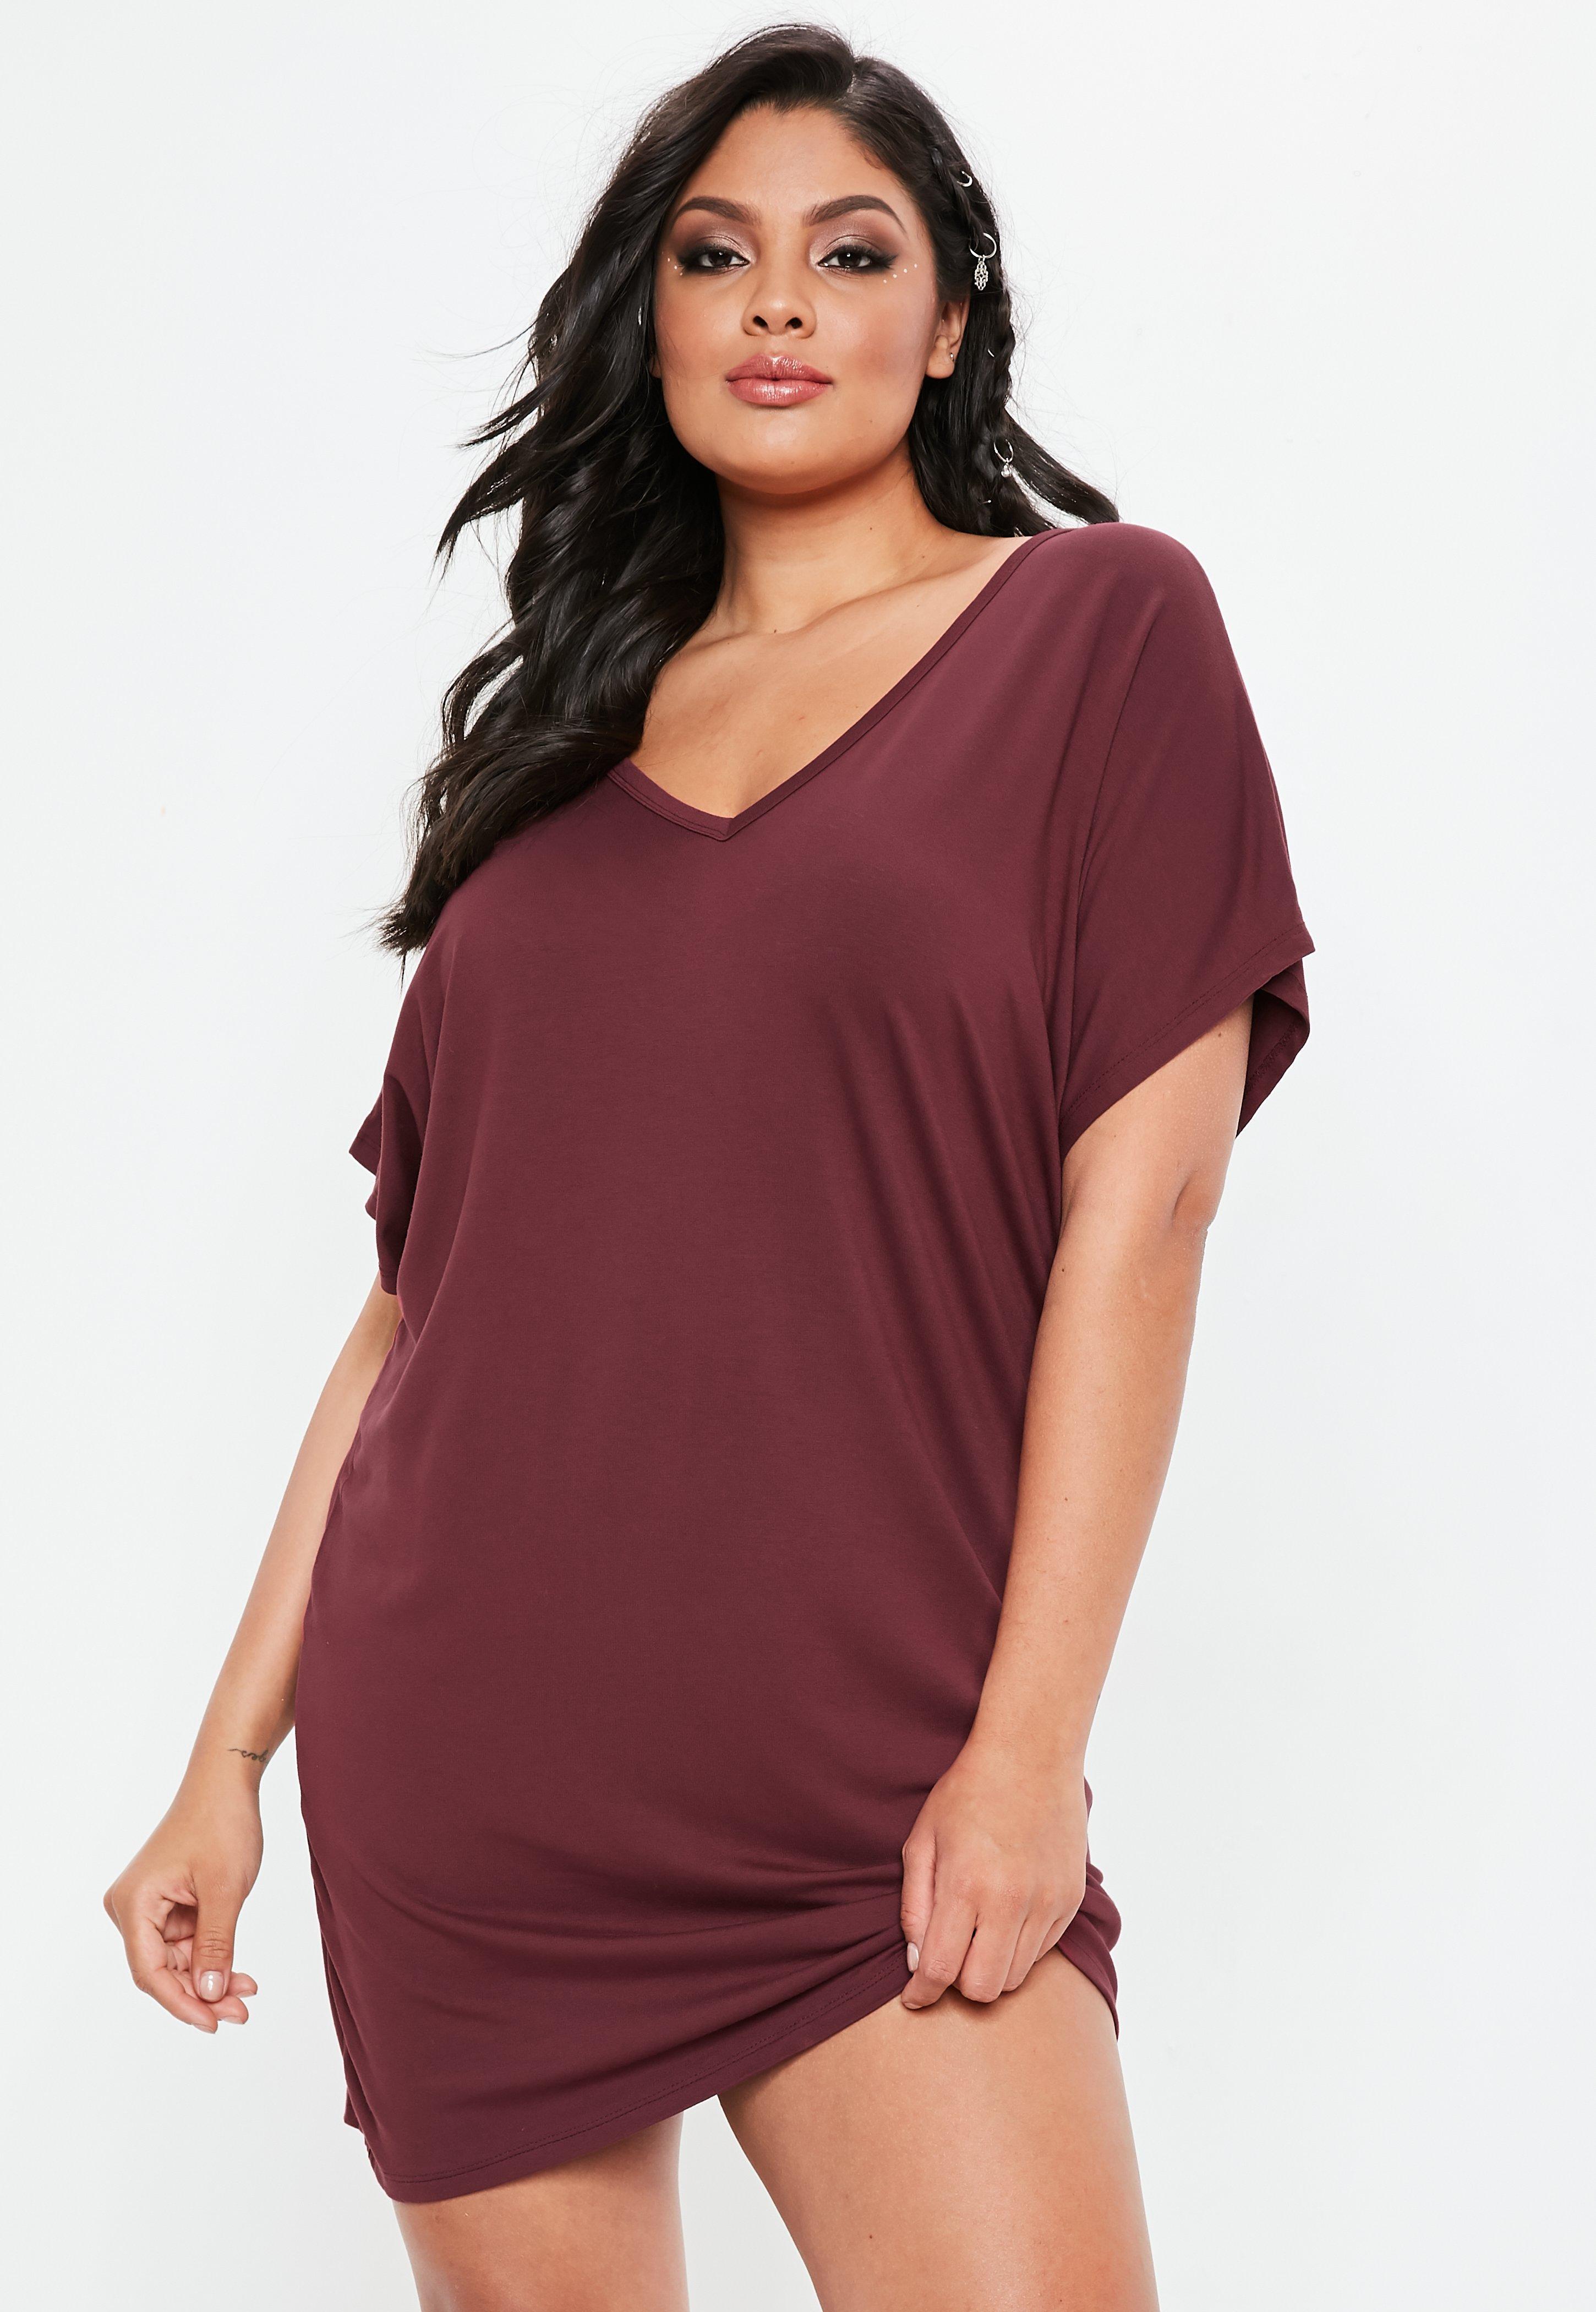 70182c07b8fbc Oversized T Shirt Dress Plus Size - BCD Tofu House